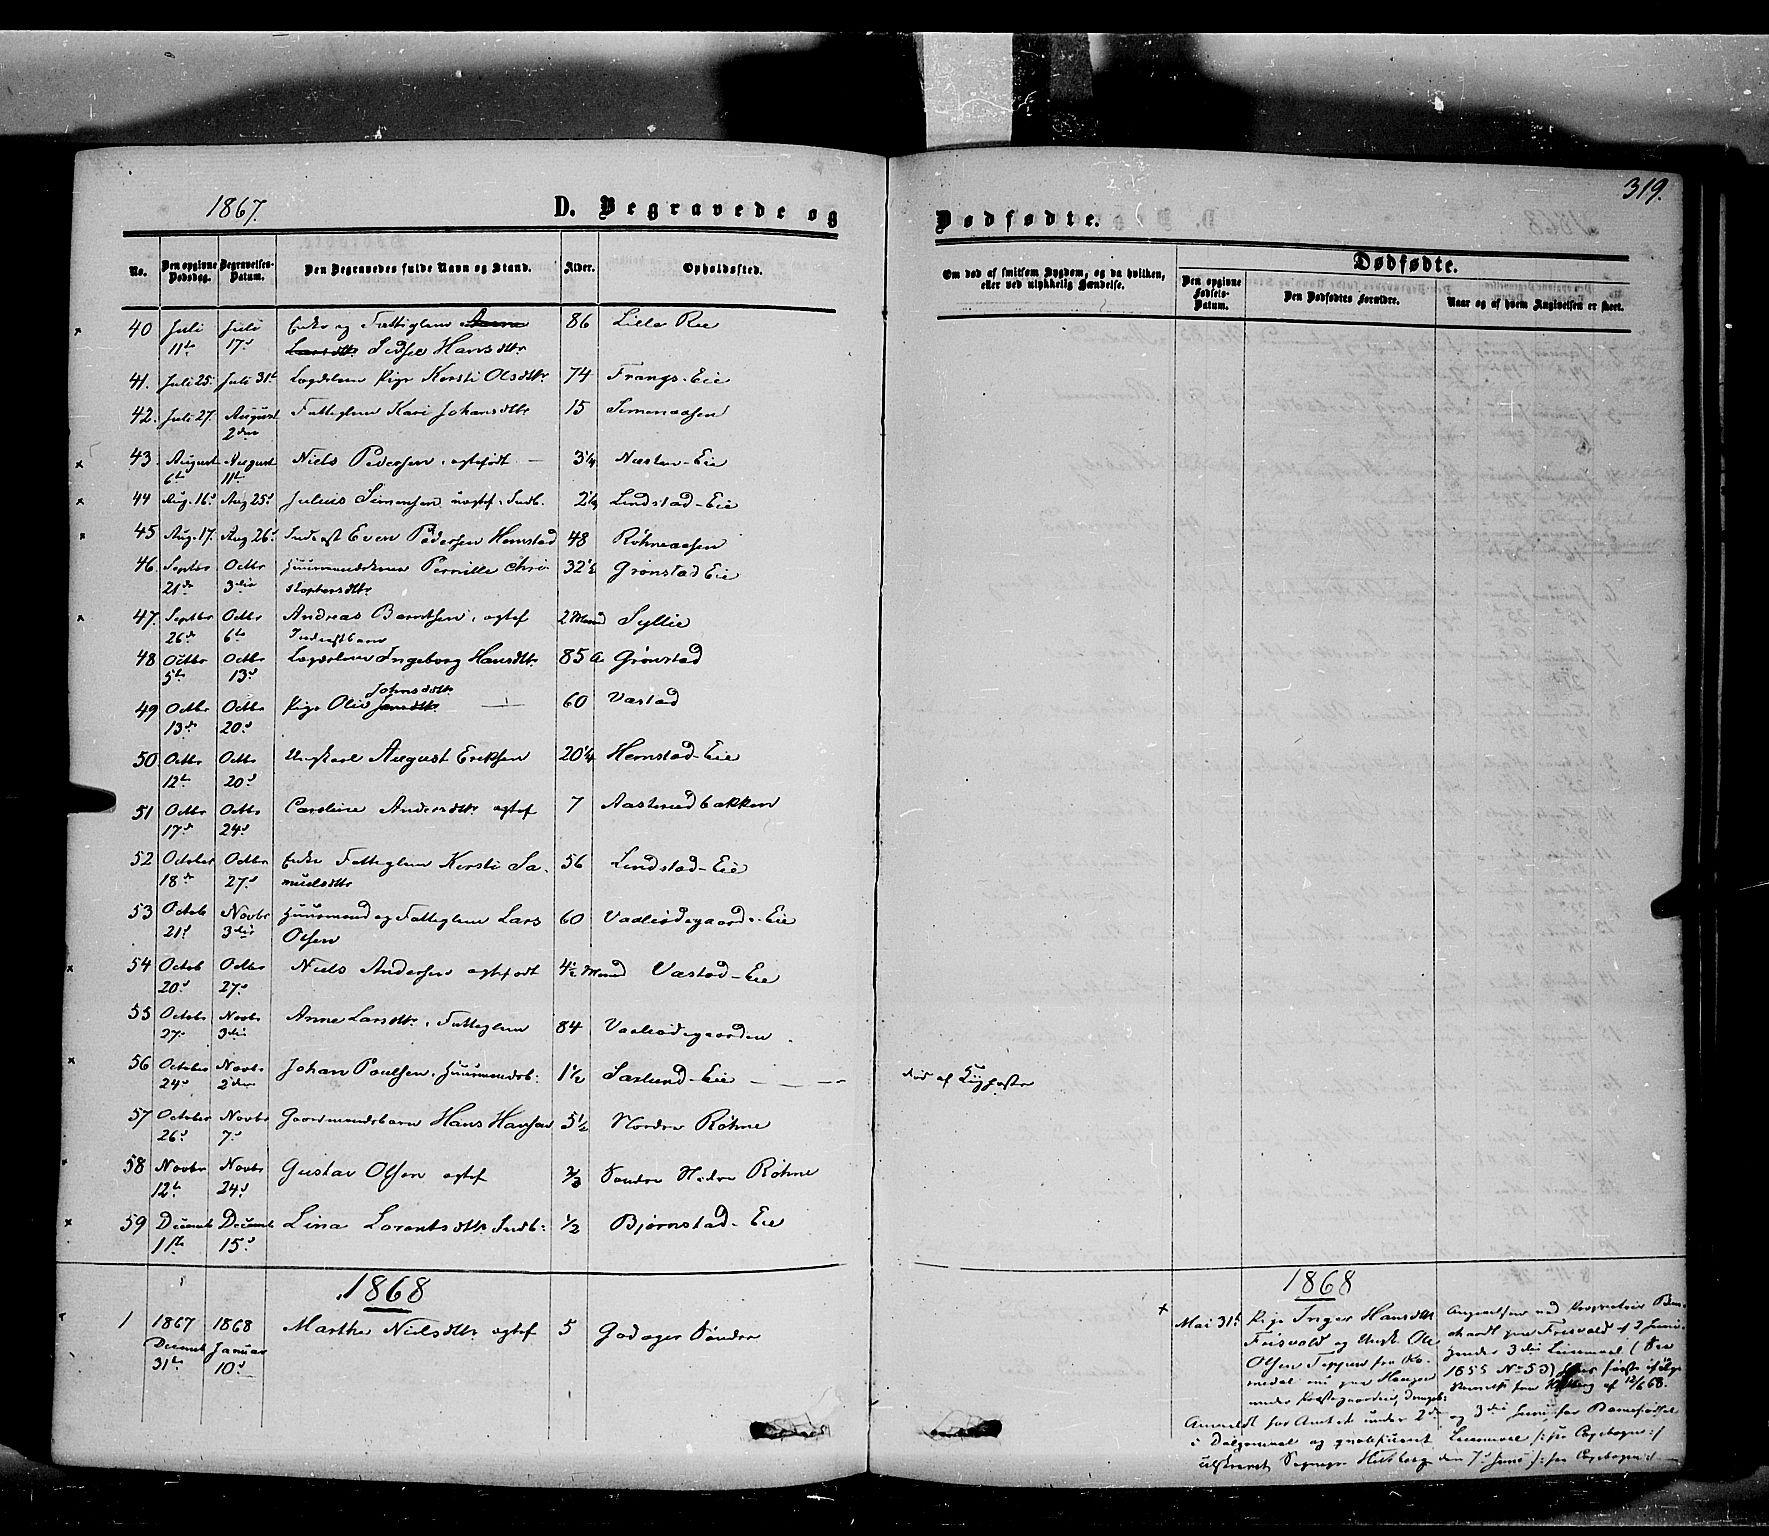 SAH, Stange prestekontor, K/L0013: Ministerialbok nr. 13, 1862-1879, s. 319